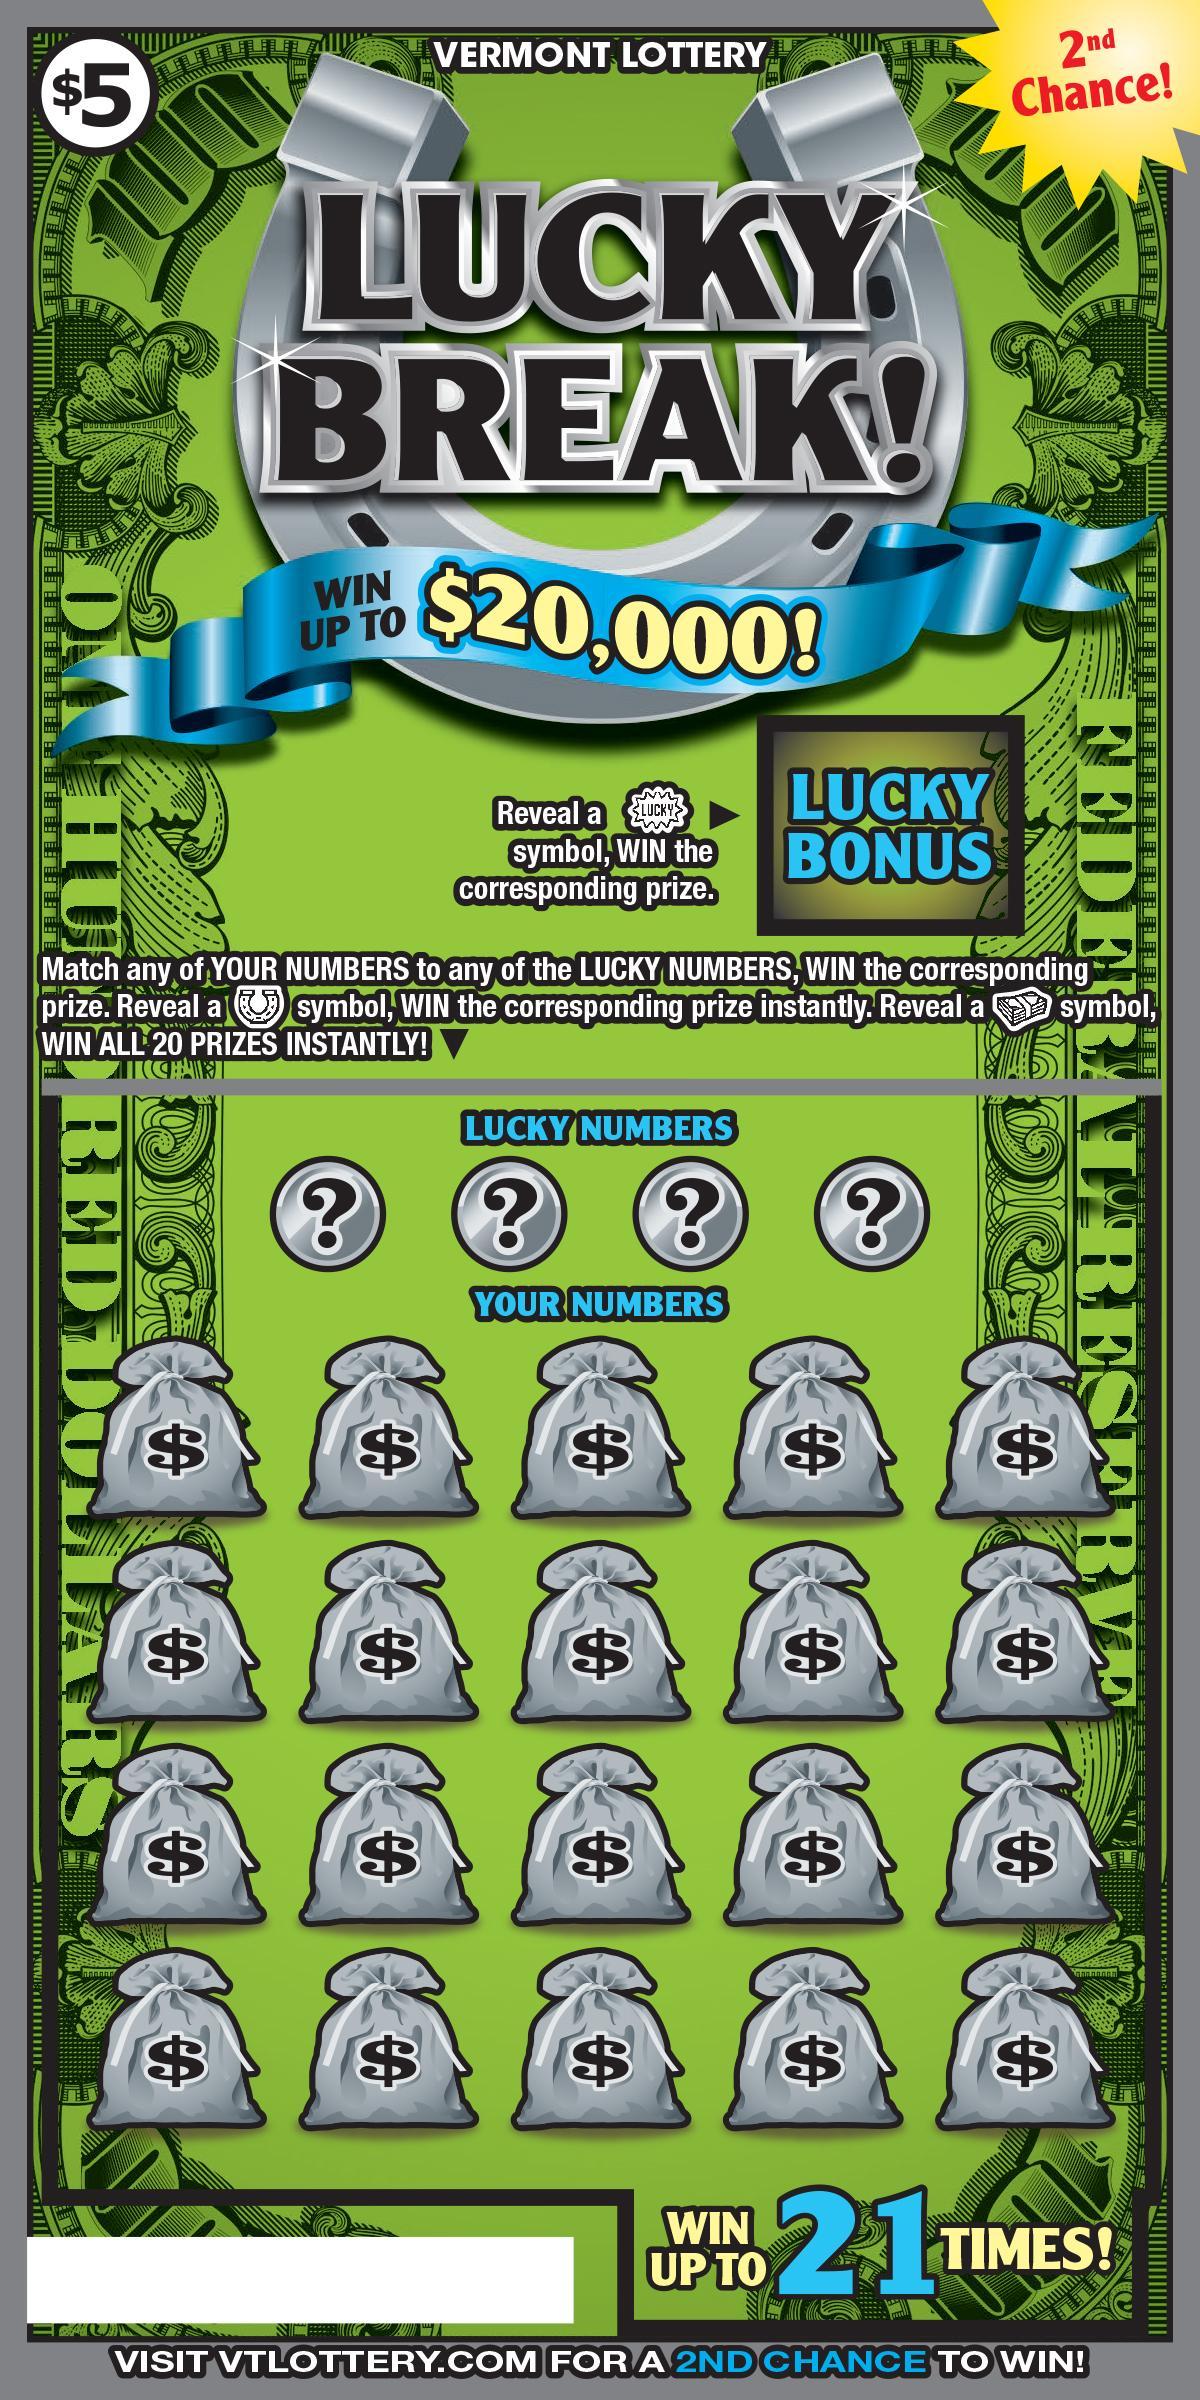 Vermont Lottery